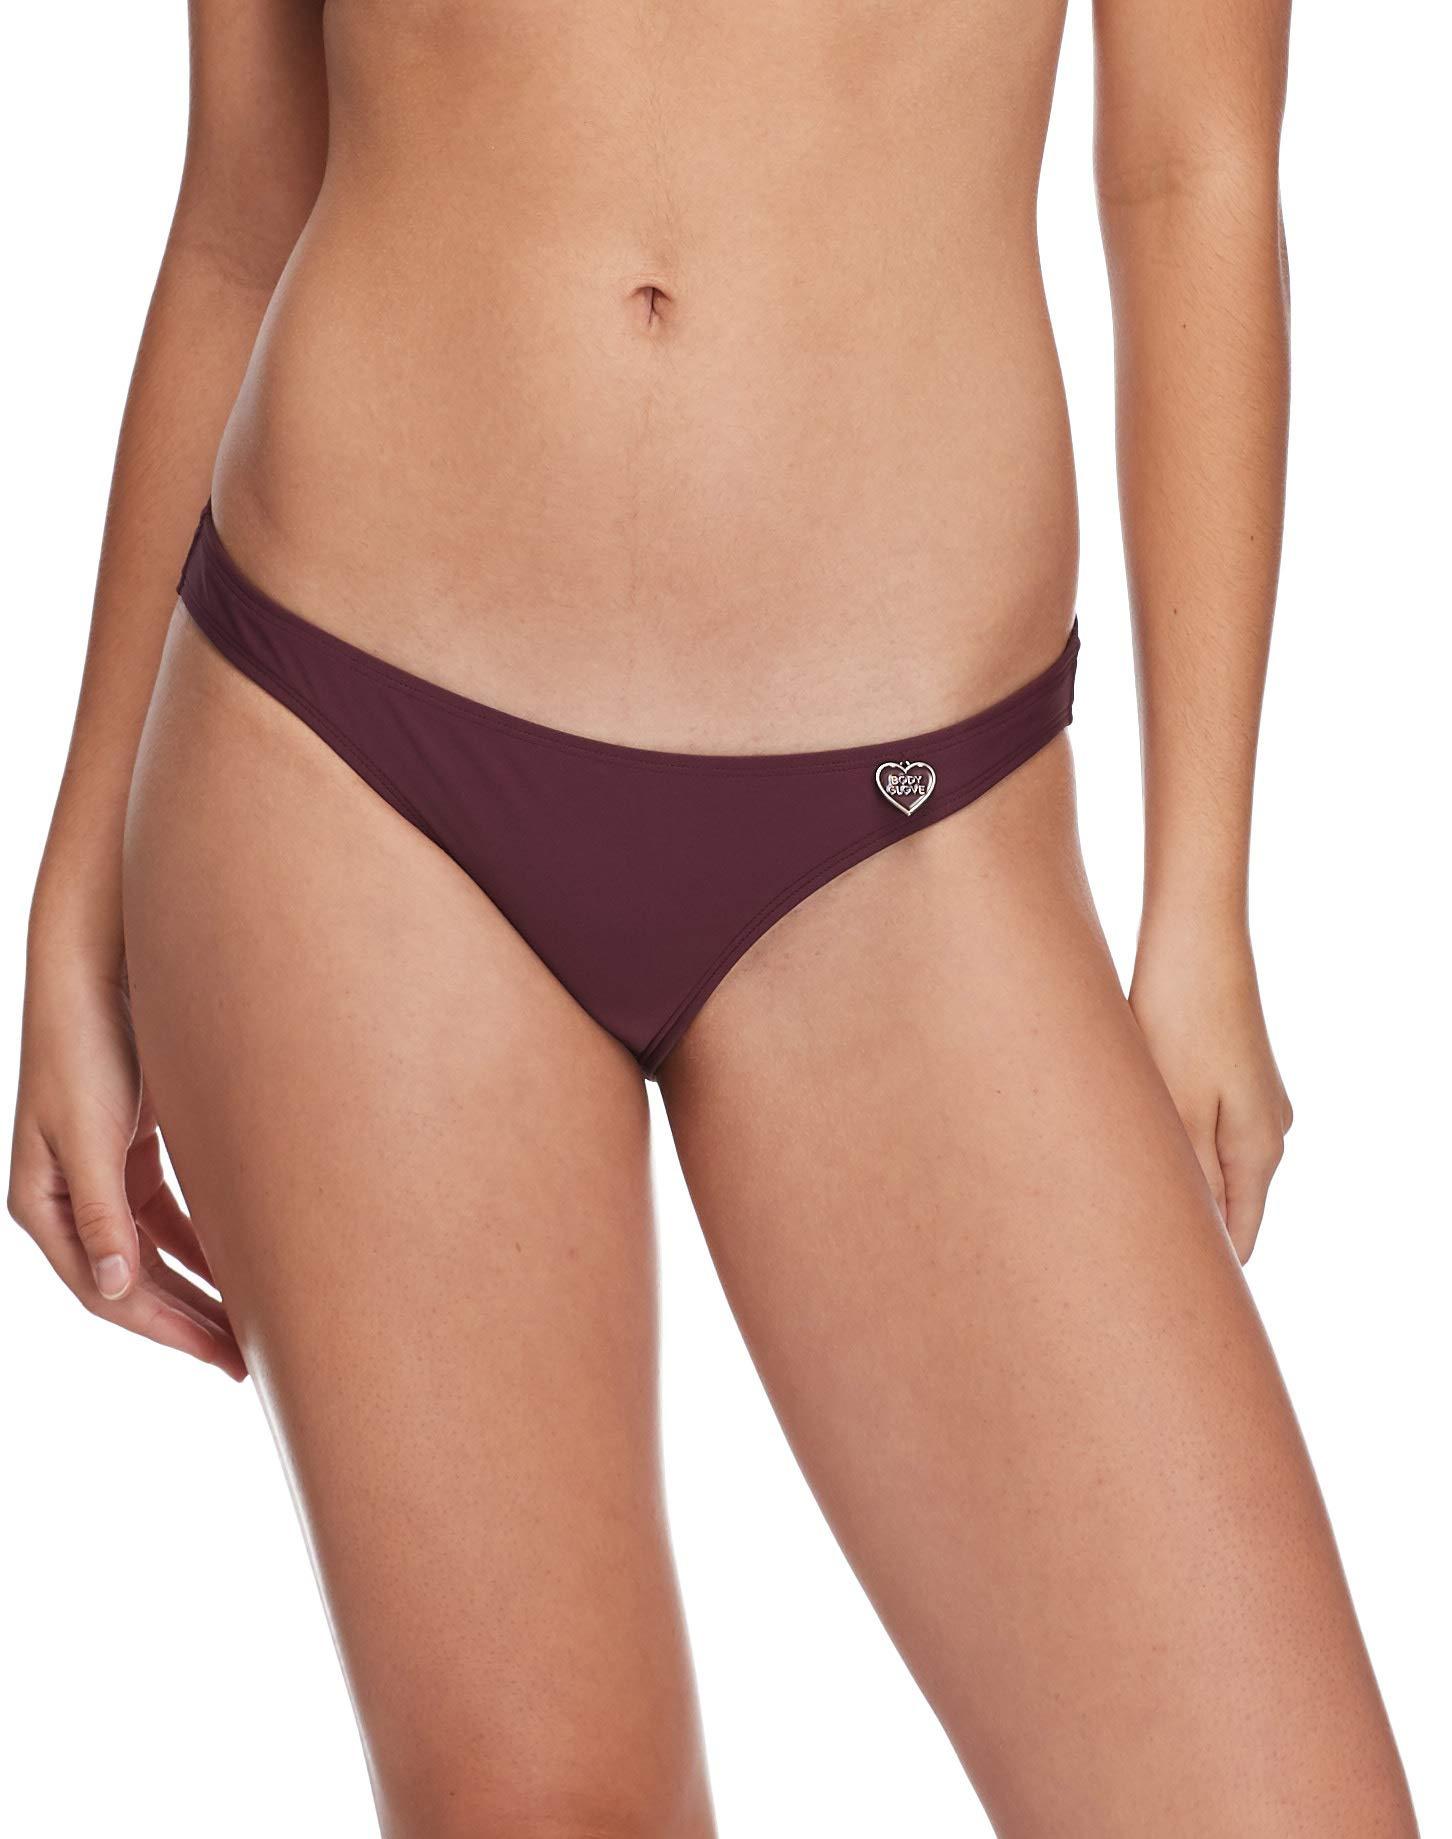 Body Glove Women's Smoothies Basic Solid Fuller Coverage Bikini Bottom Swimsuit, Porto, X-Small